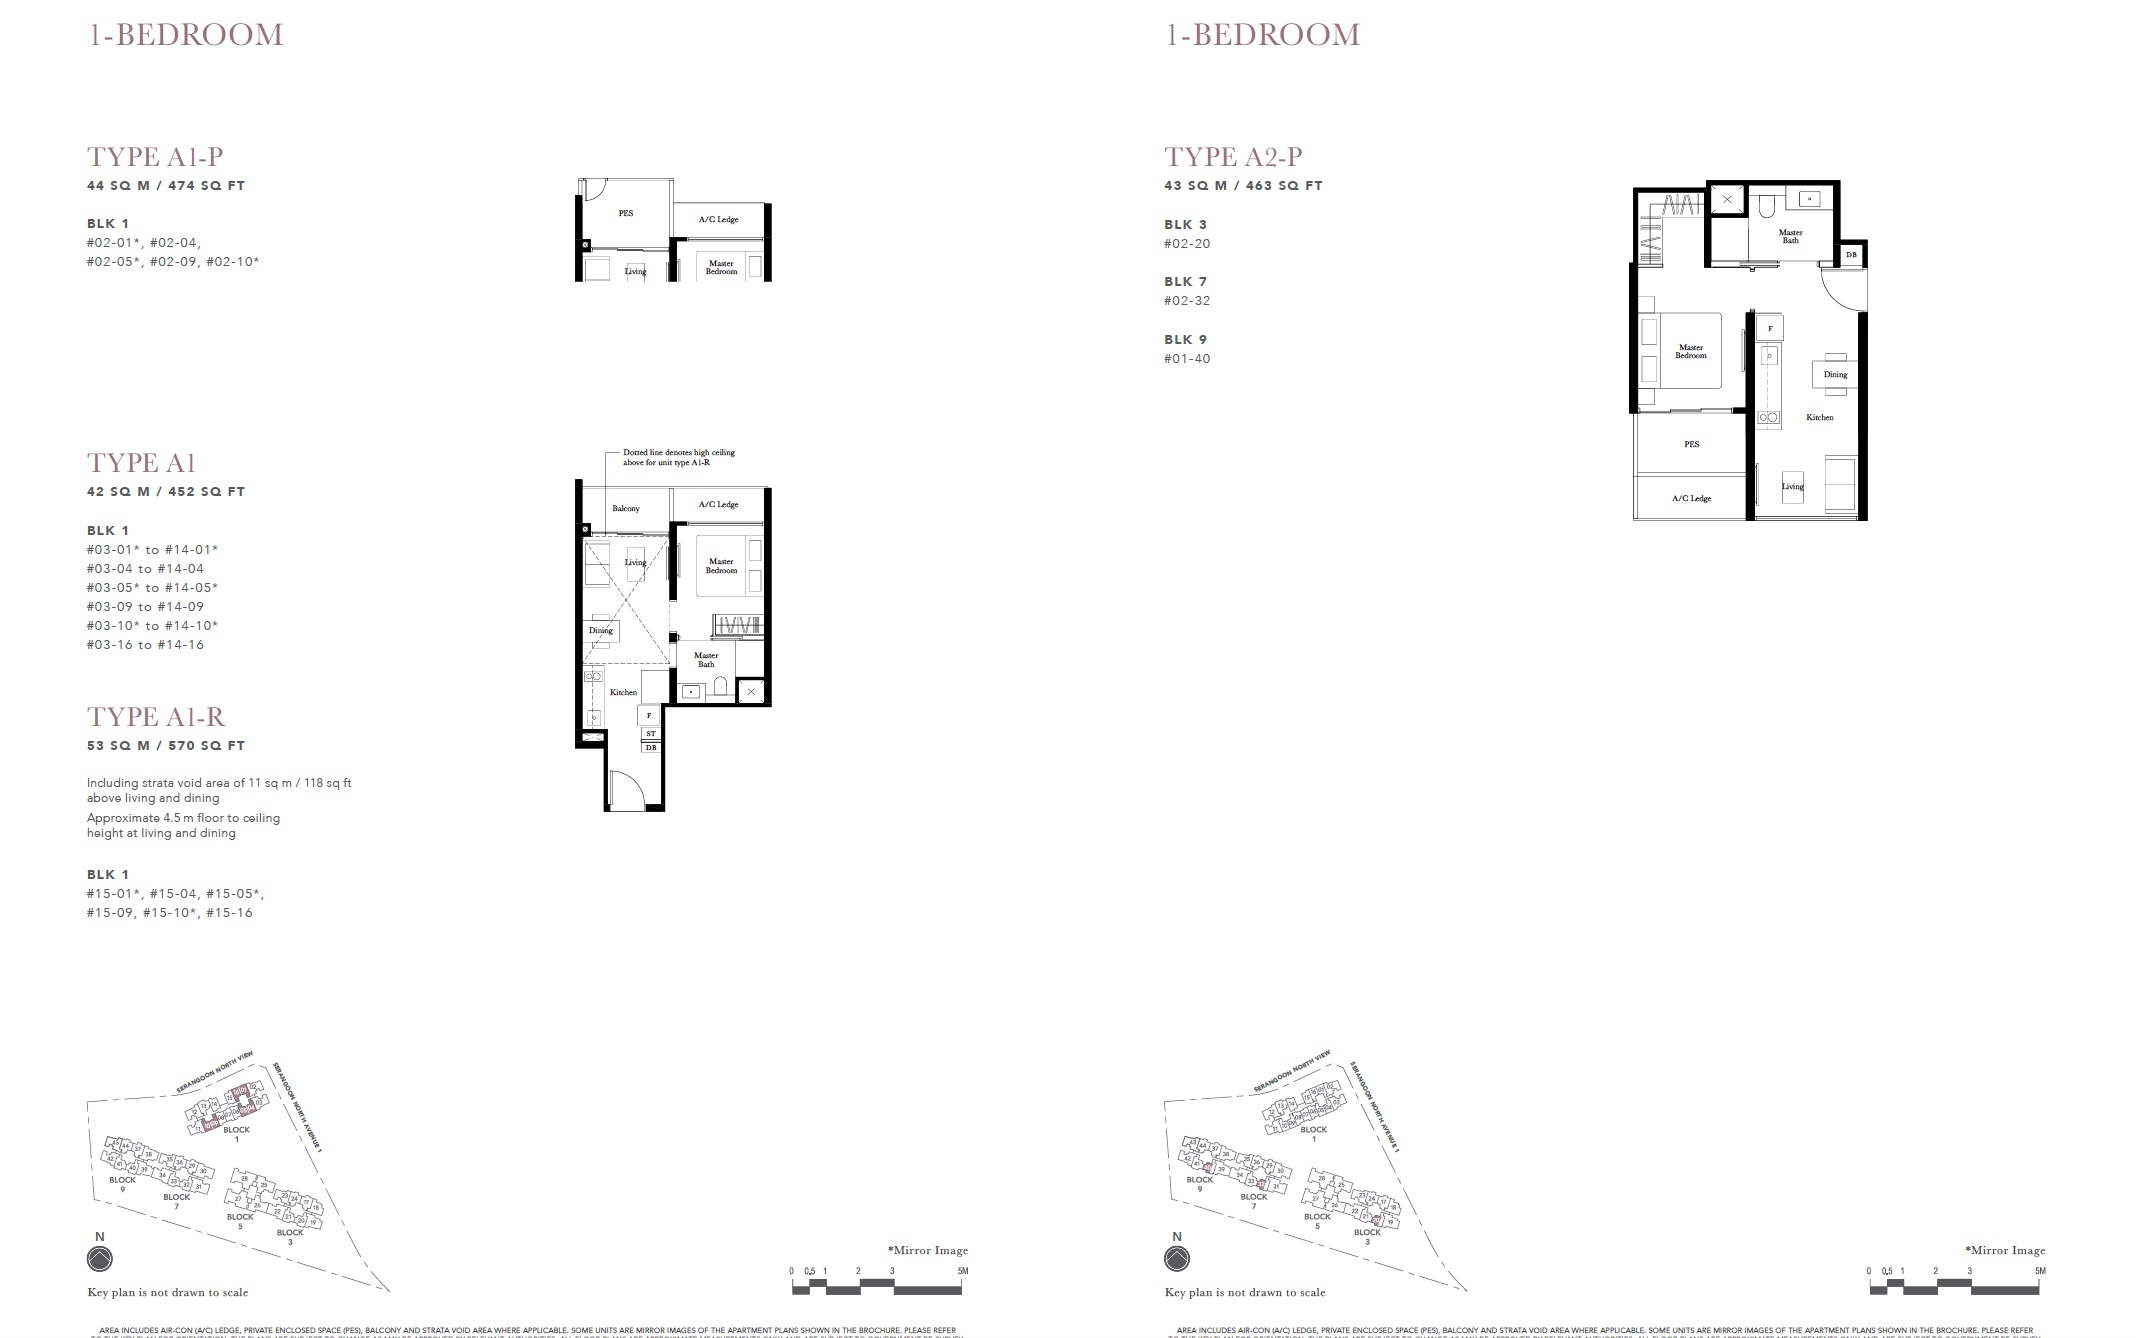 1br-the-garden-residences-floor-plan